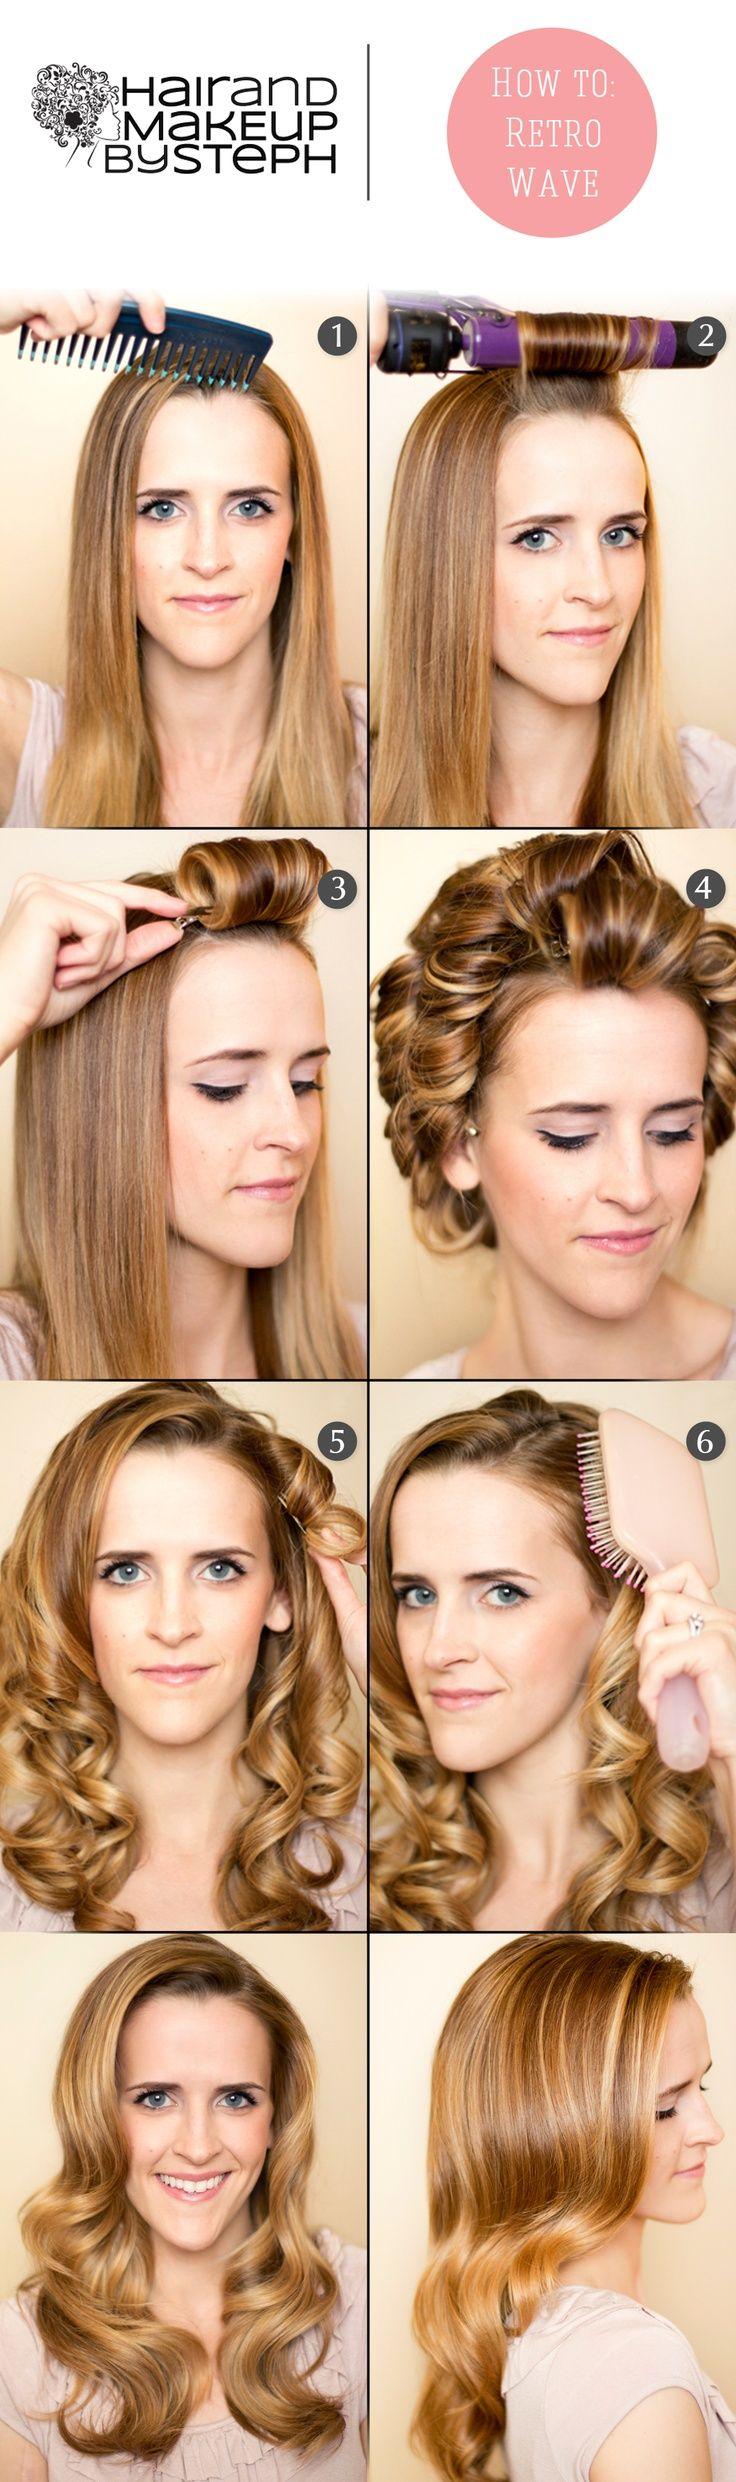 20 stylish retro wavy hairstyle tutorials and hair looks - pretty